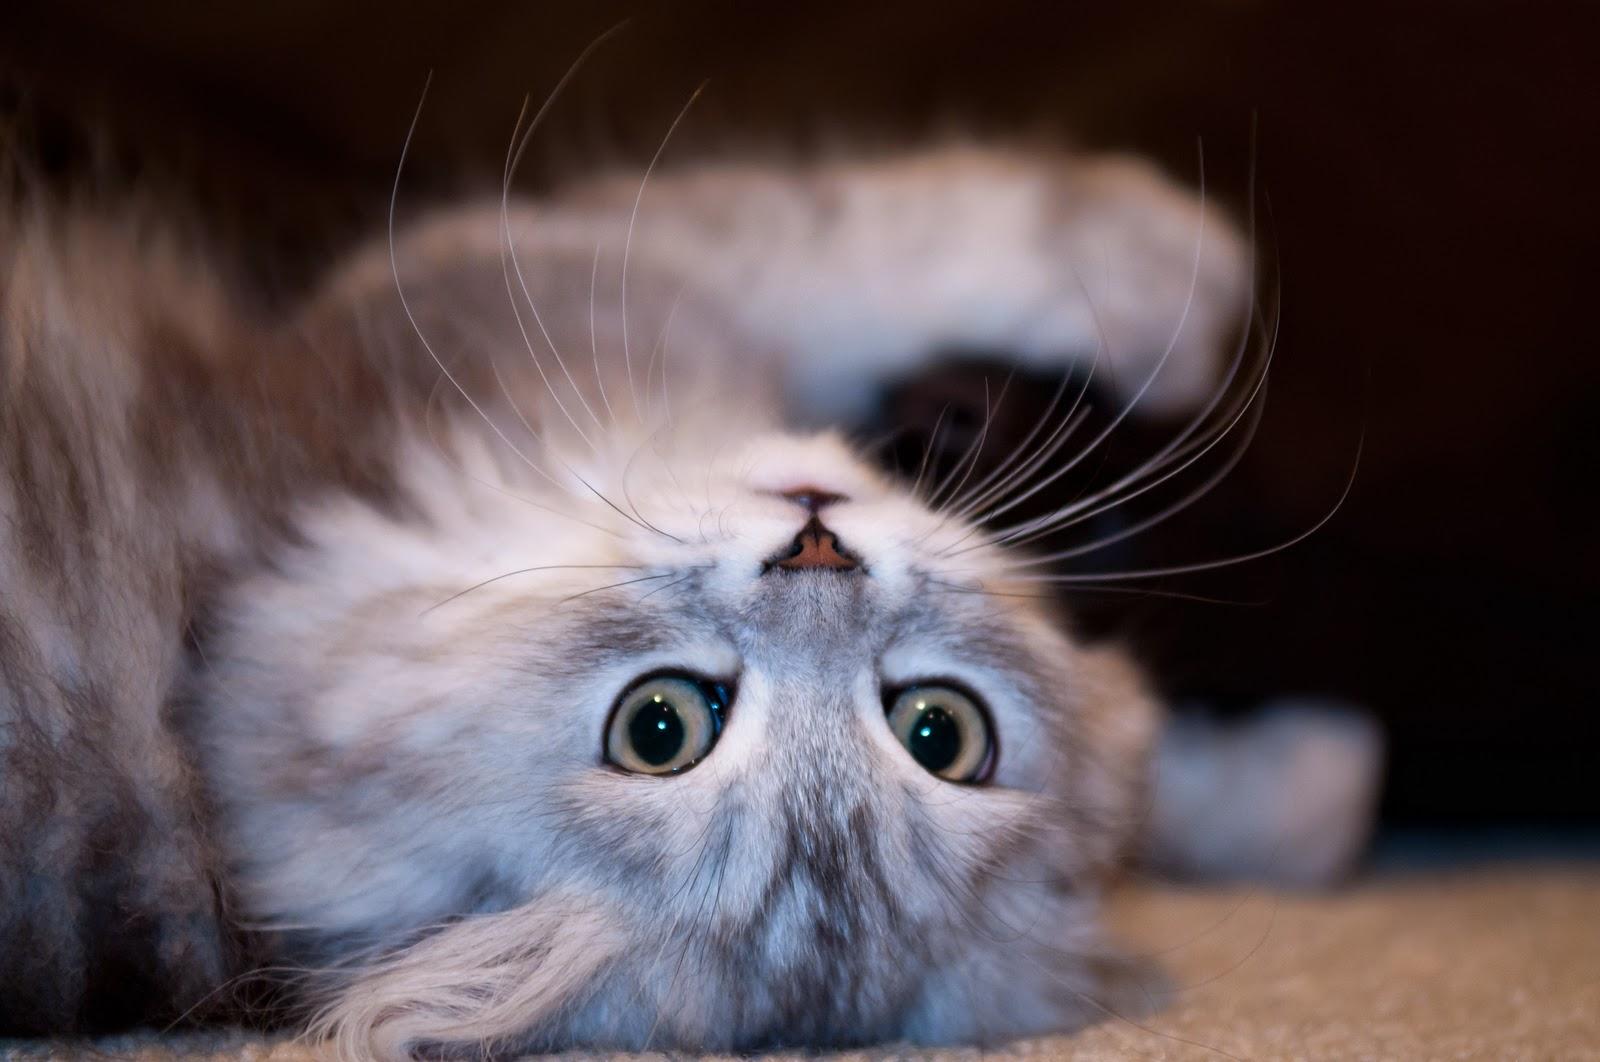 Gambar Kucing Versi Ml godean.web.id